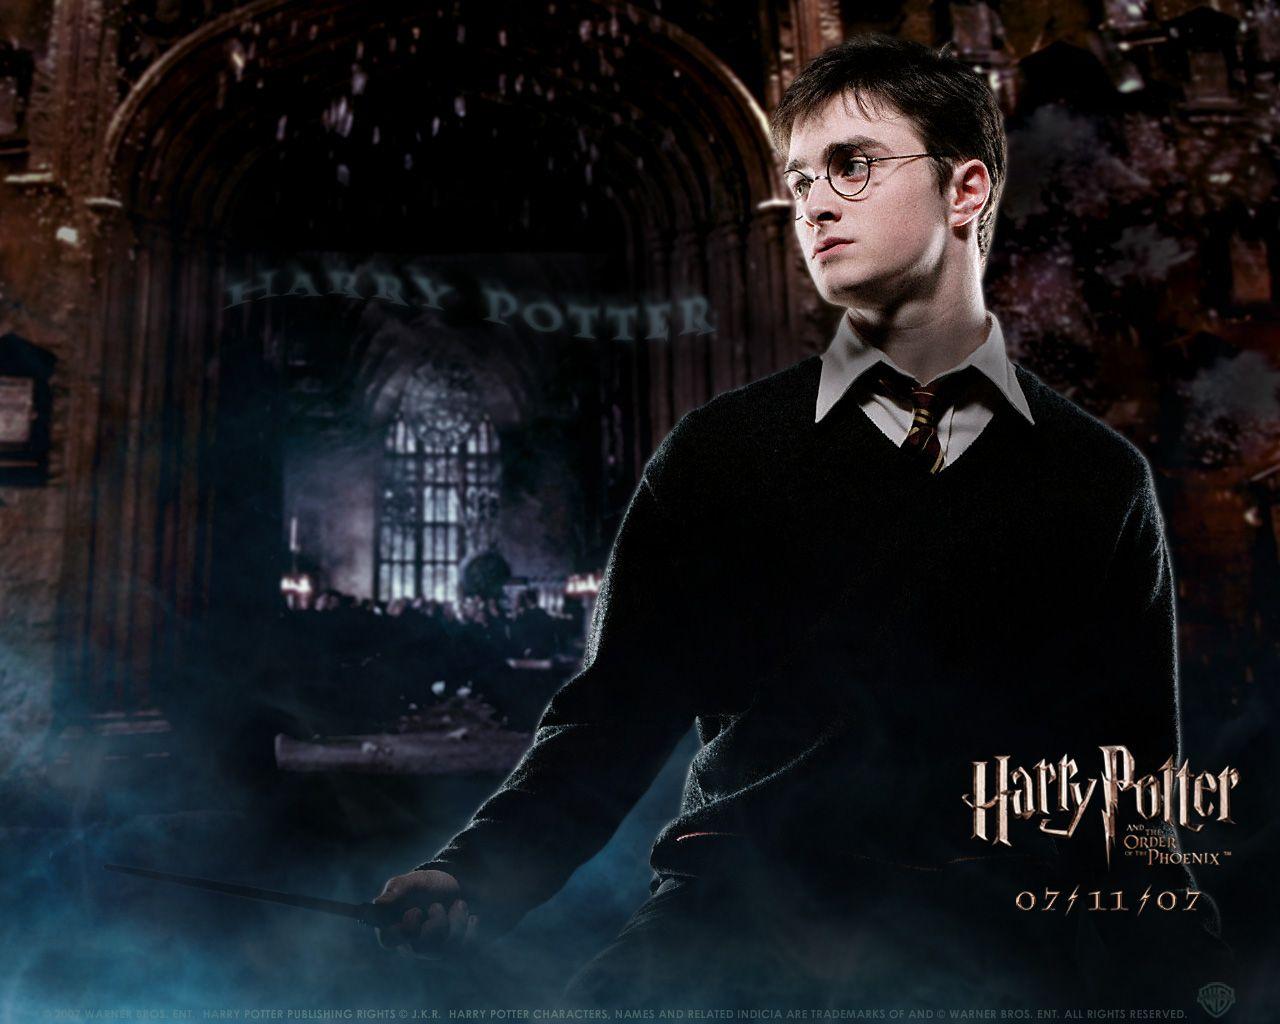 Top Wallpaper Harry Potter Love - b653274e508a7218e6bf7ed5c85ca5bf  Pictures_655838.jpg